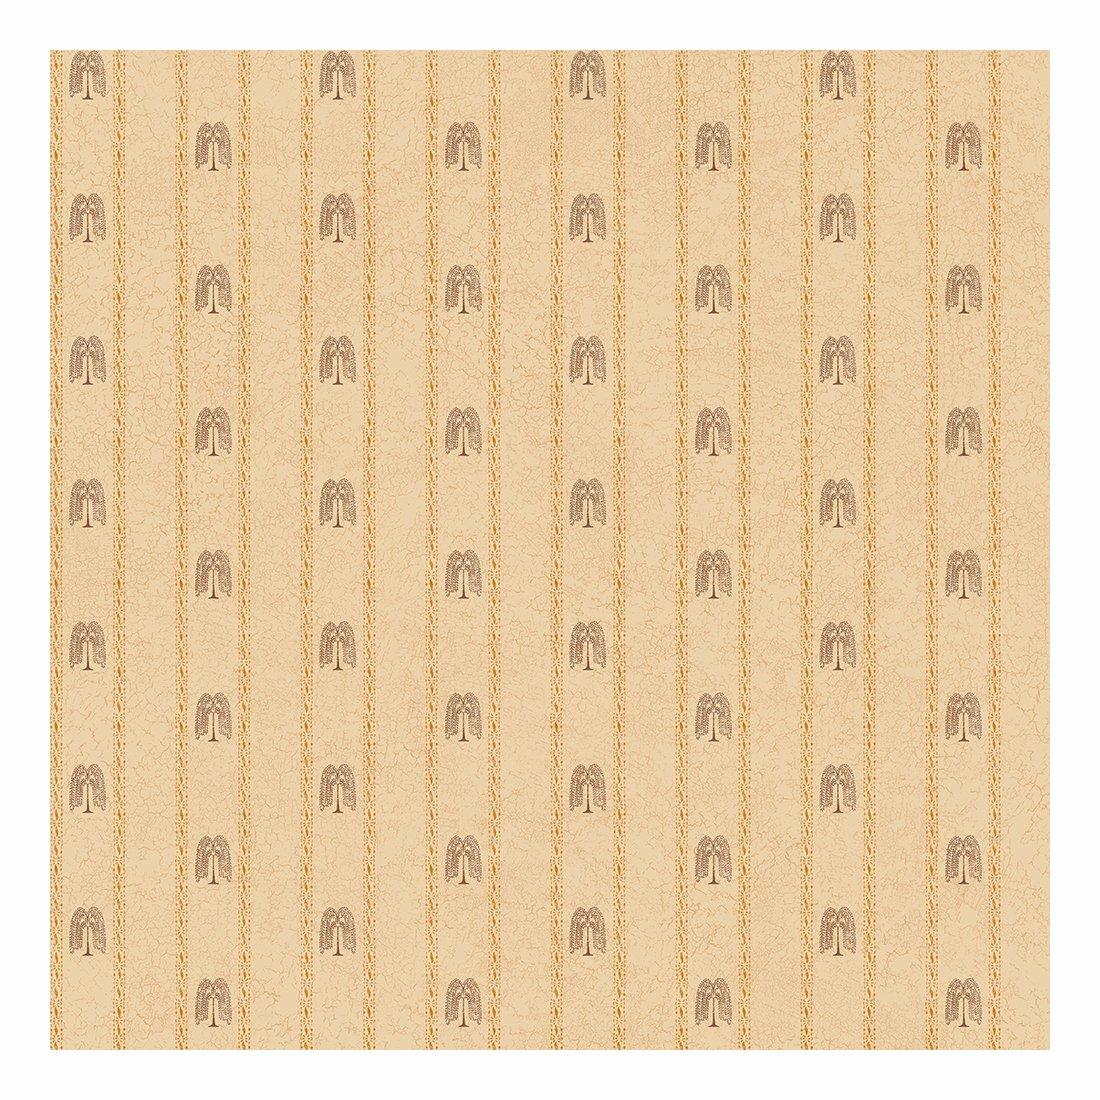 York Wallcoverings SM8727SMP Small Treasures Primitive Weeping Willow Stripe 8 x 10 Wallpaper Memo Sample